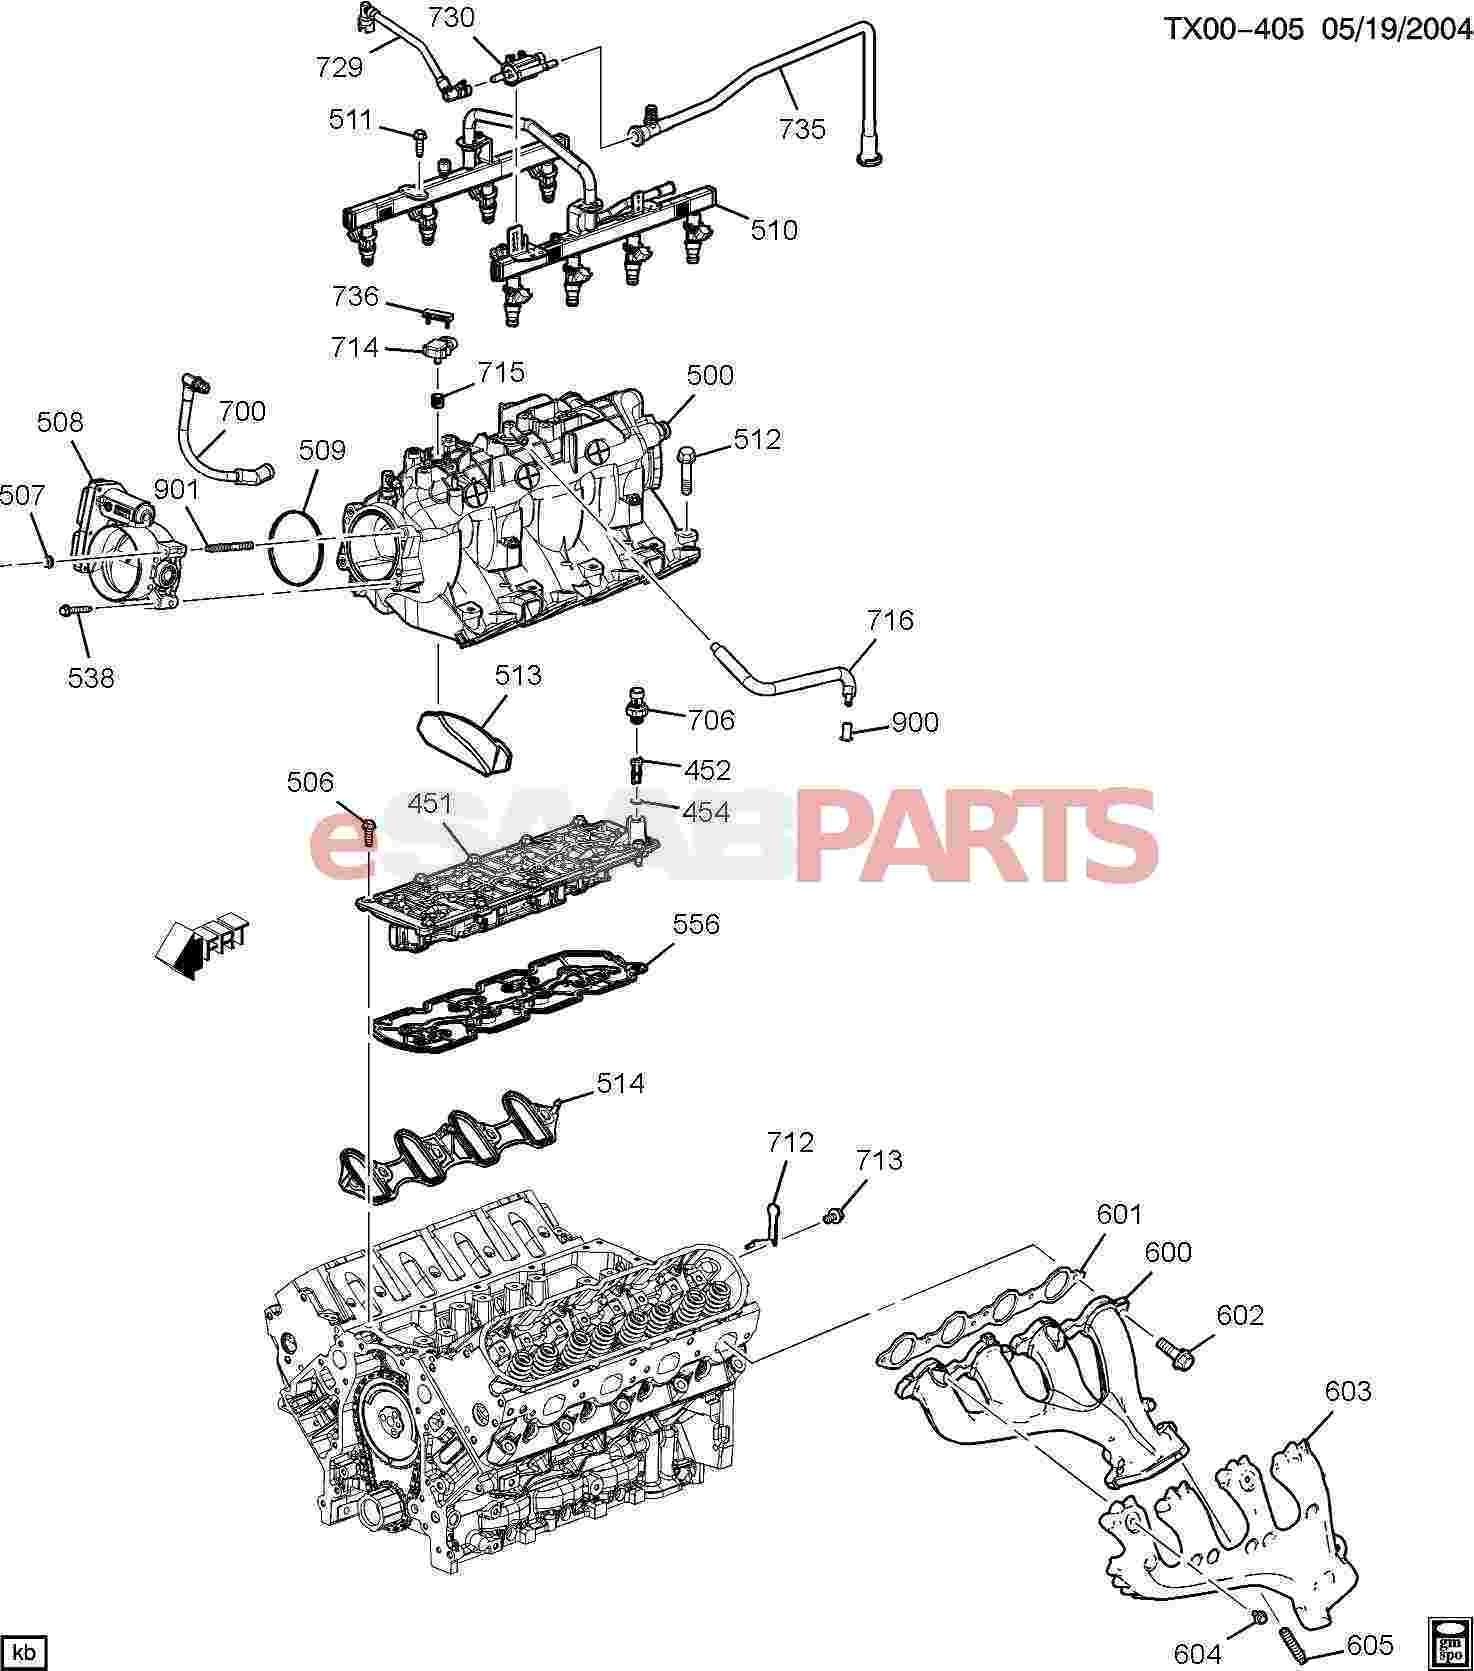 V8 Engine Parts Diagram Esaabparts Saab 9 7x Engine Parts Engine Internal 5 3m Of V8 Engine Parts Diagram